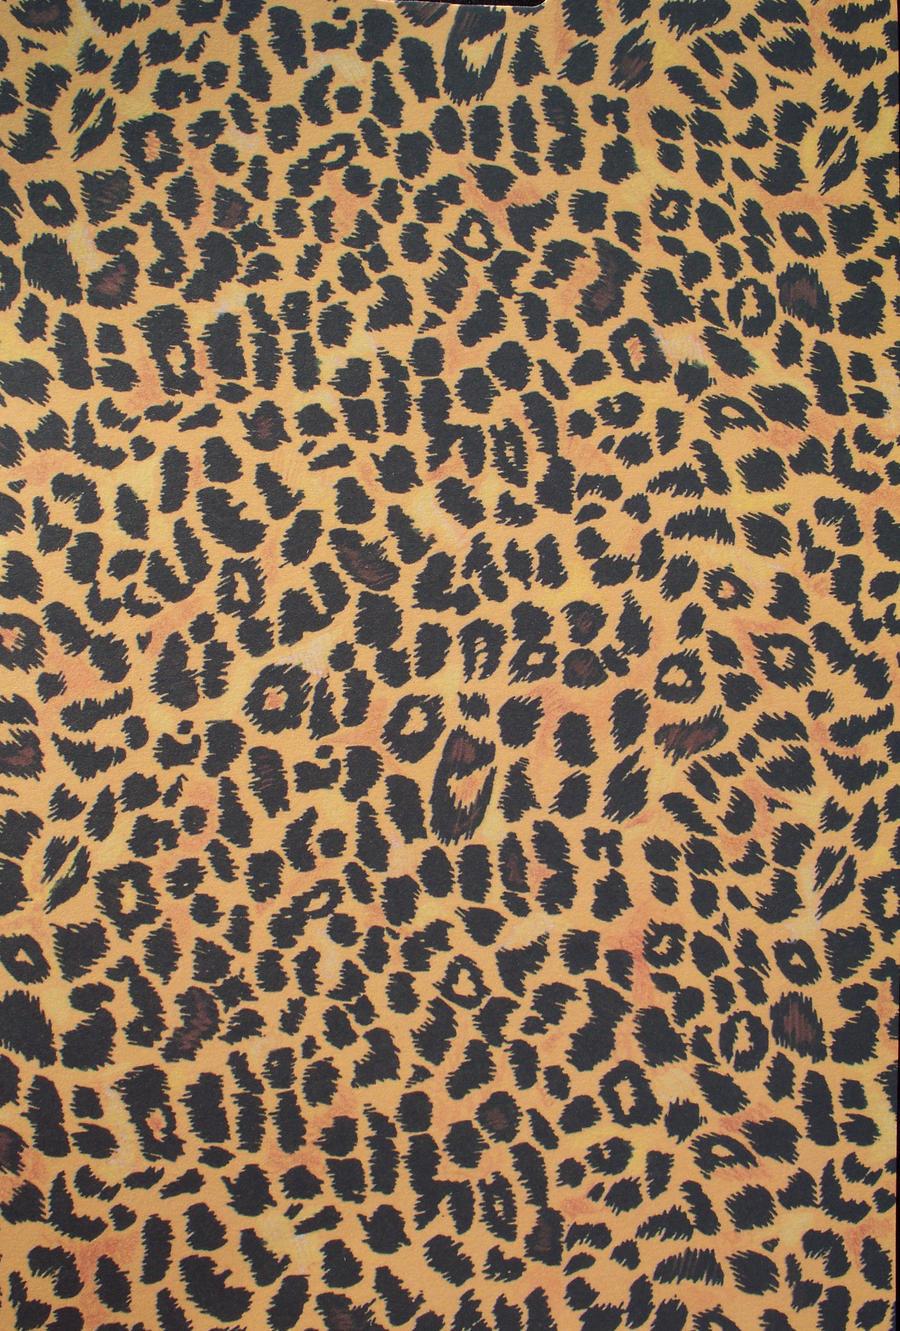 Leopard by Penny-Stock